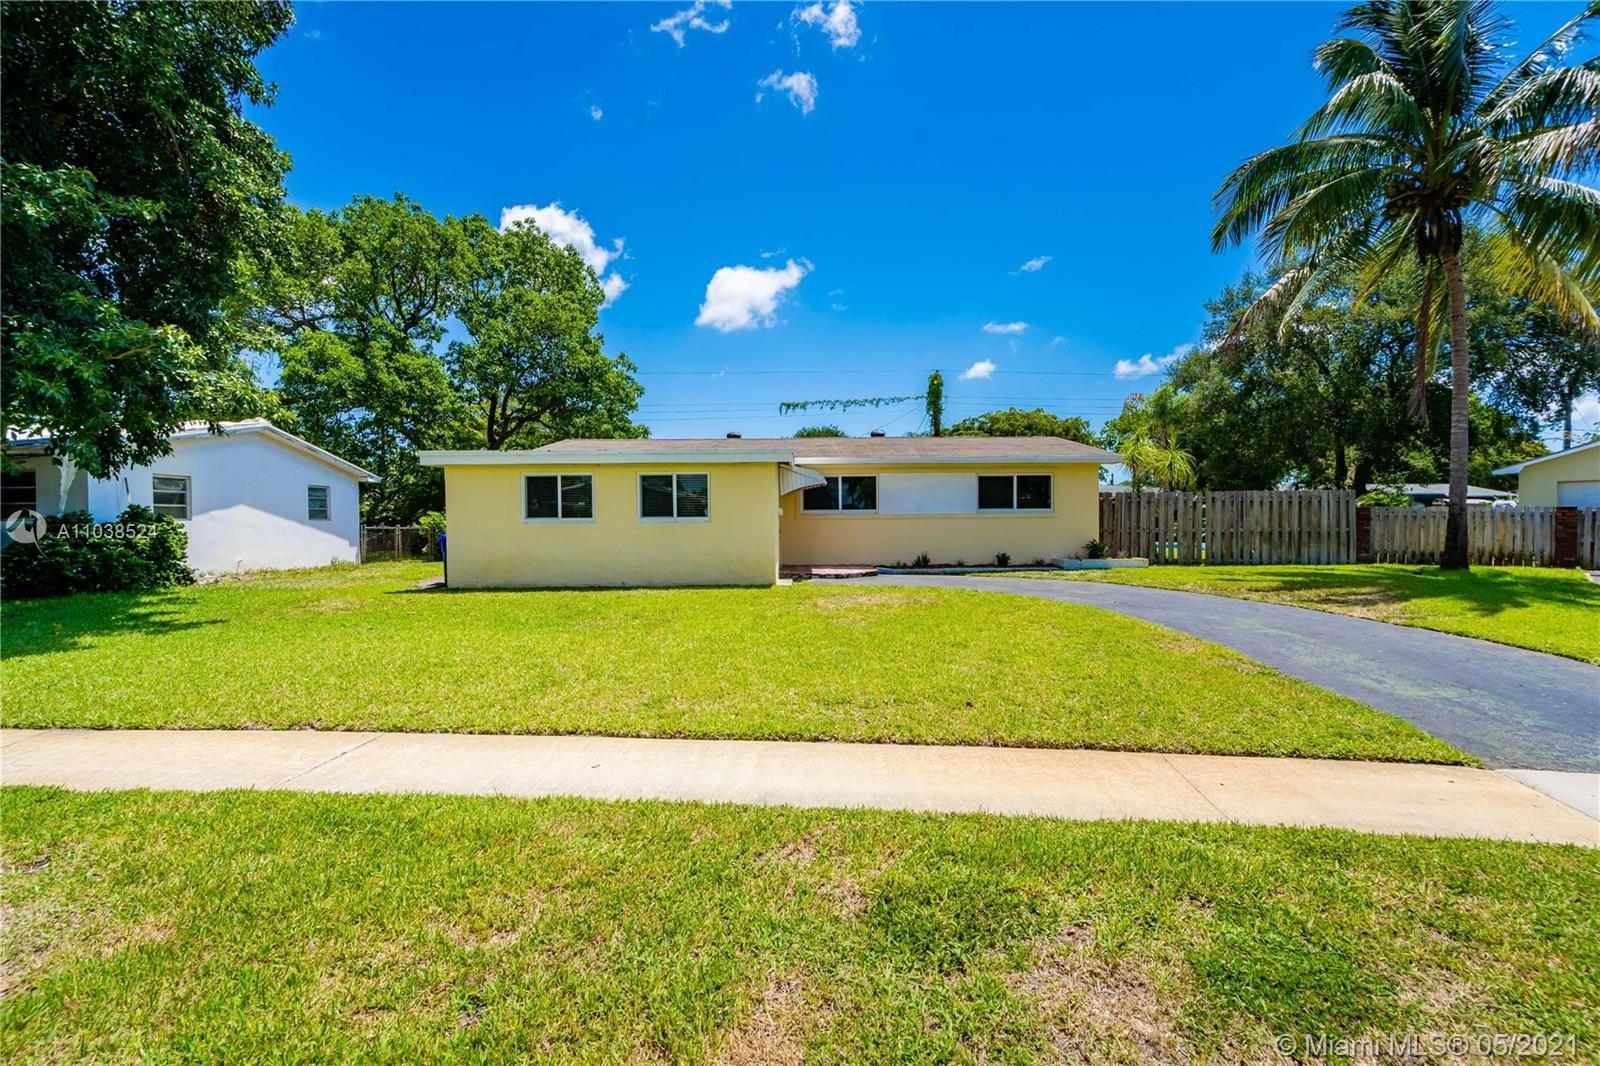 Photo of 321 SW 68th Ter, Pembroke Pines, FL 33023 (MLS # A11038524)